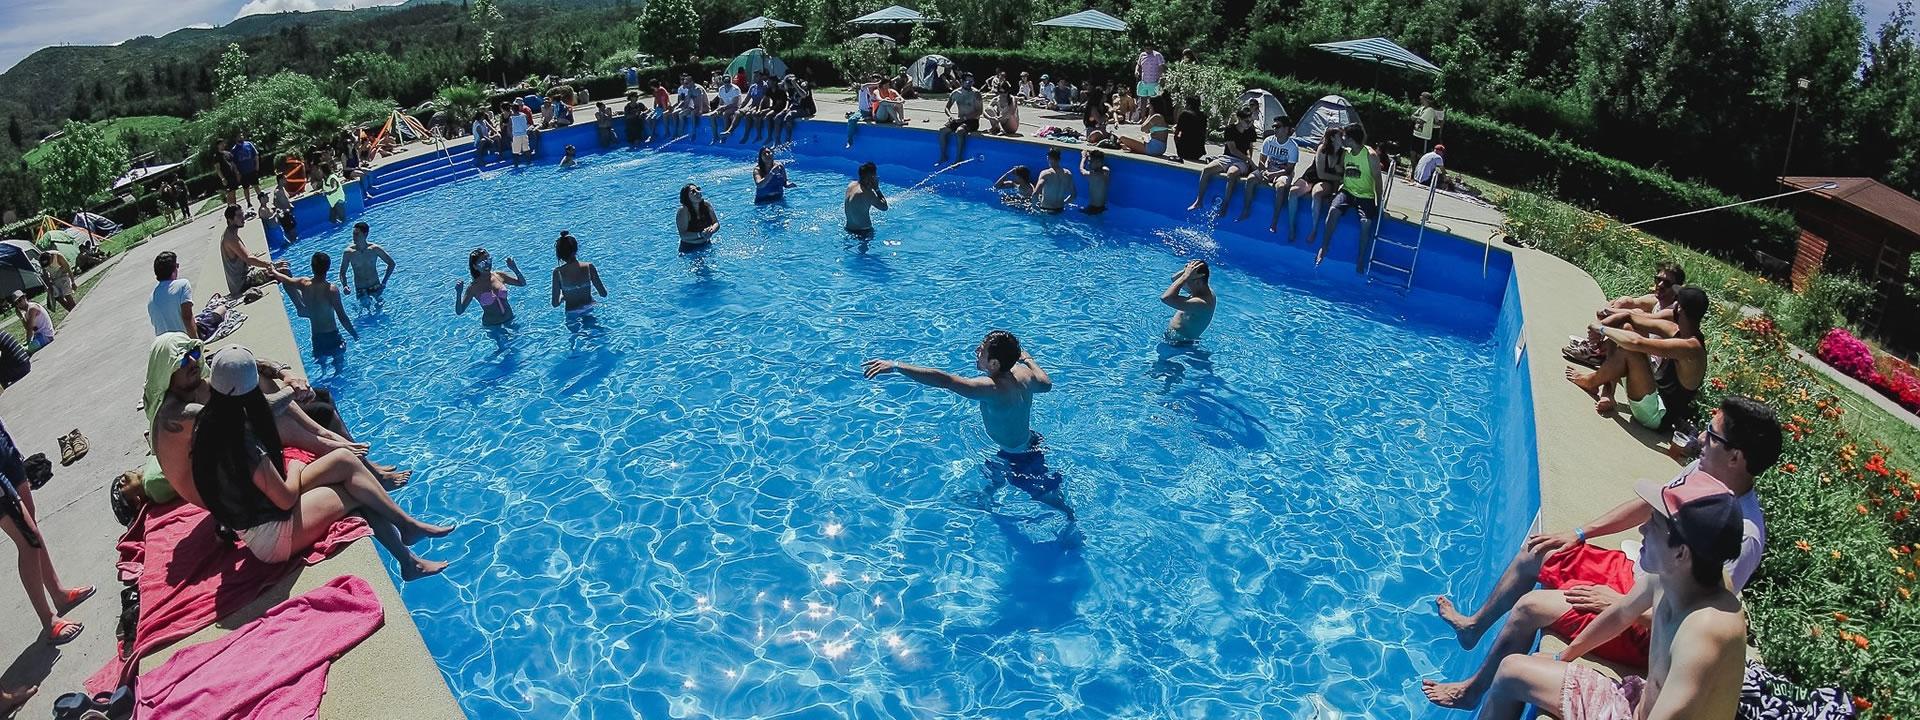 Caba as con piscinas en quill n camping precios econ micos for Piscinas precios baratos